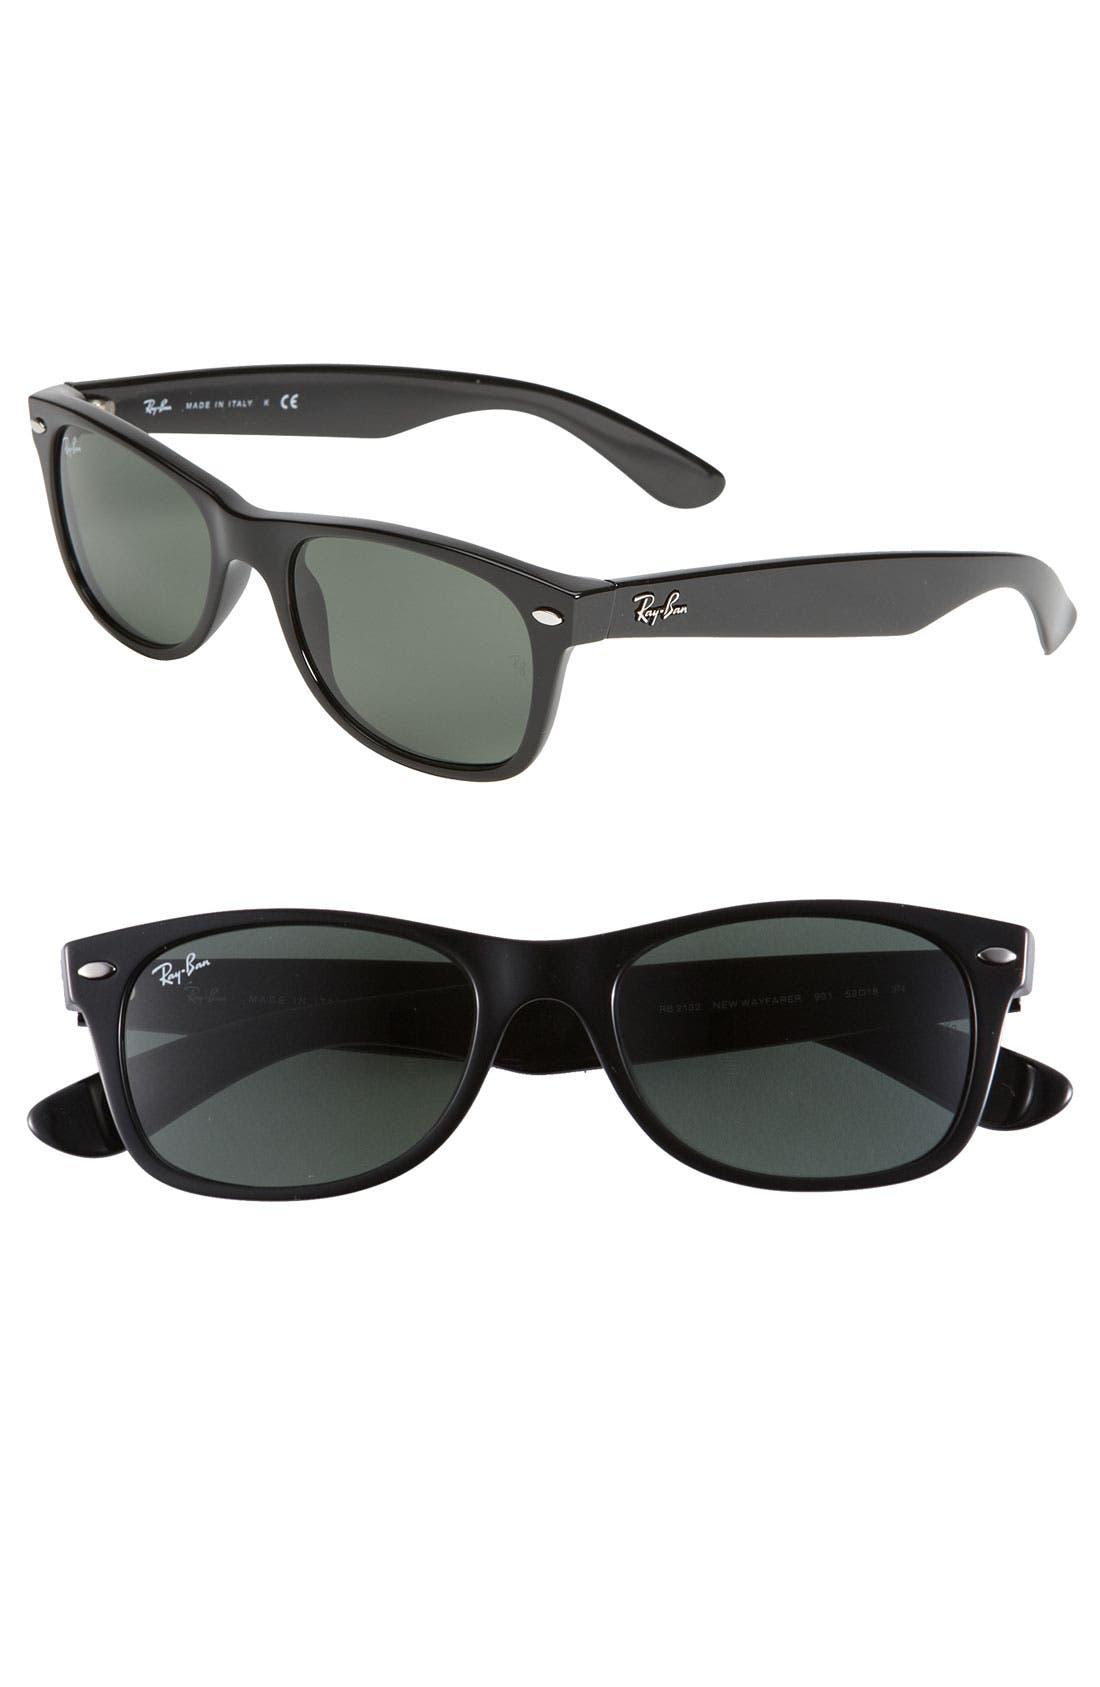 Main Image - Ray-Ban Small New Wayfarer 52mm Sunglasses